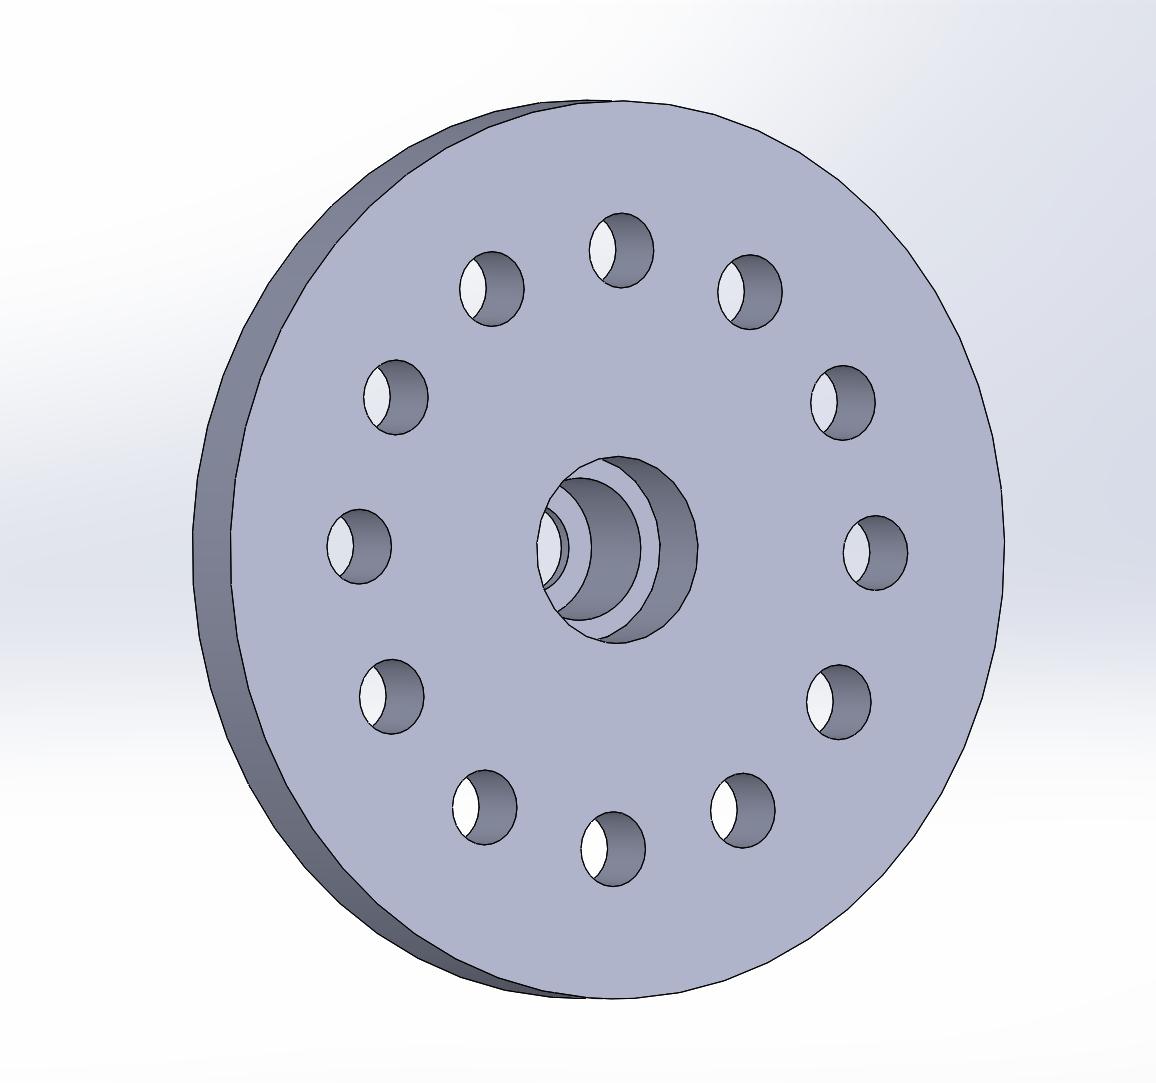 Picture of Gear Attachment Piece